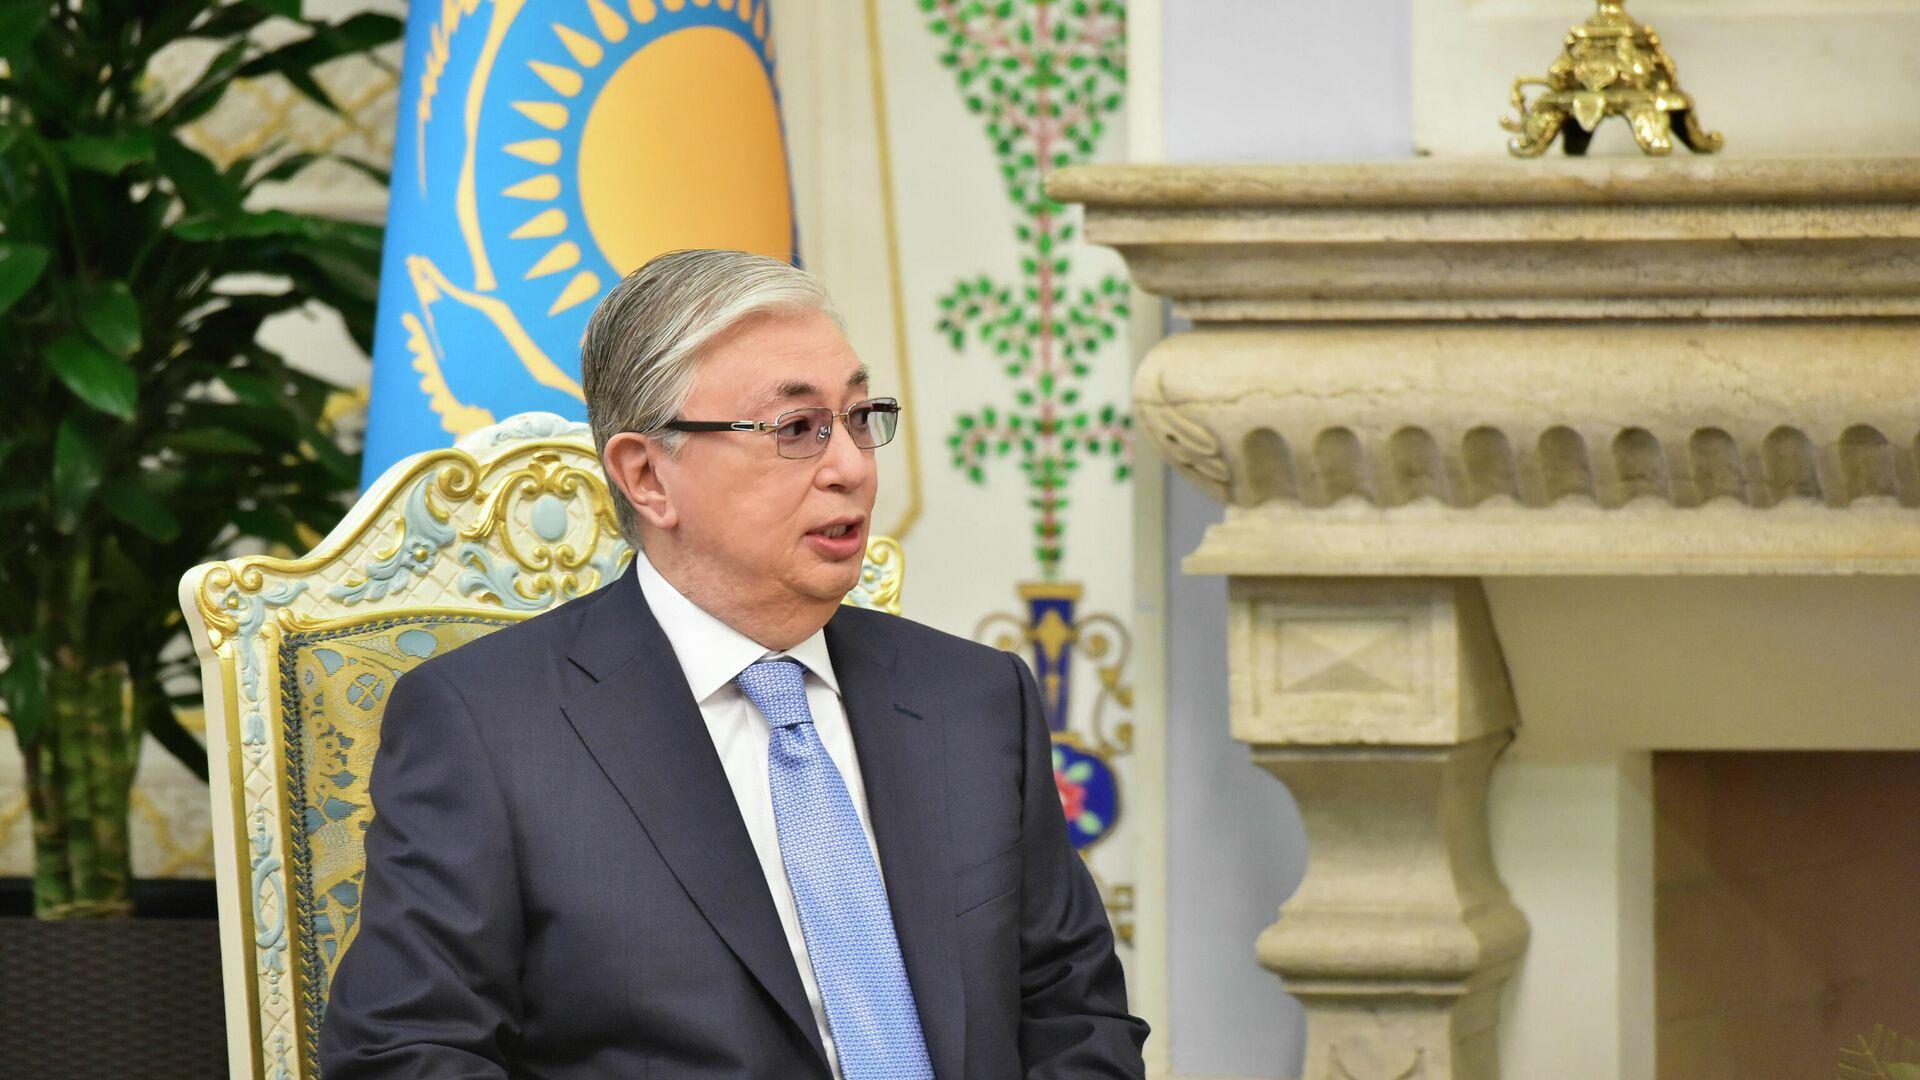 Президент Казахстана Касым-Жомарт Токаев - Sputnik Таджикистан, 1920, 06.08.2021